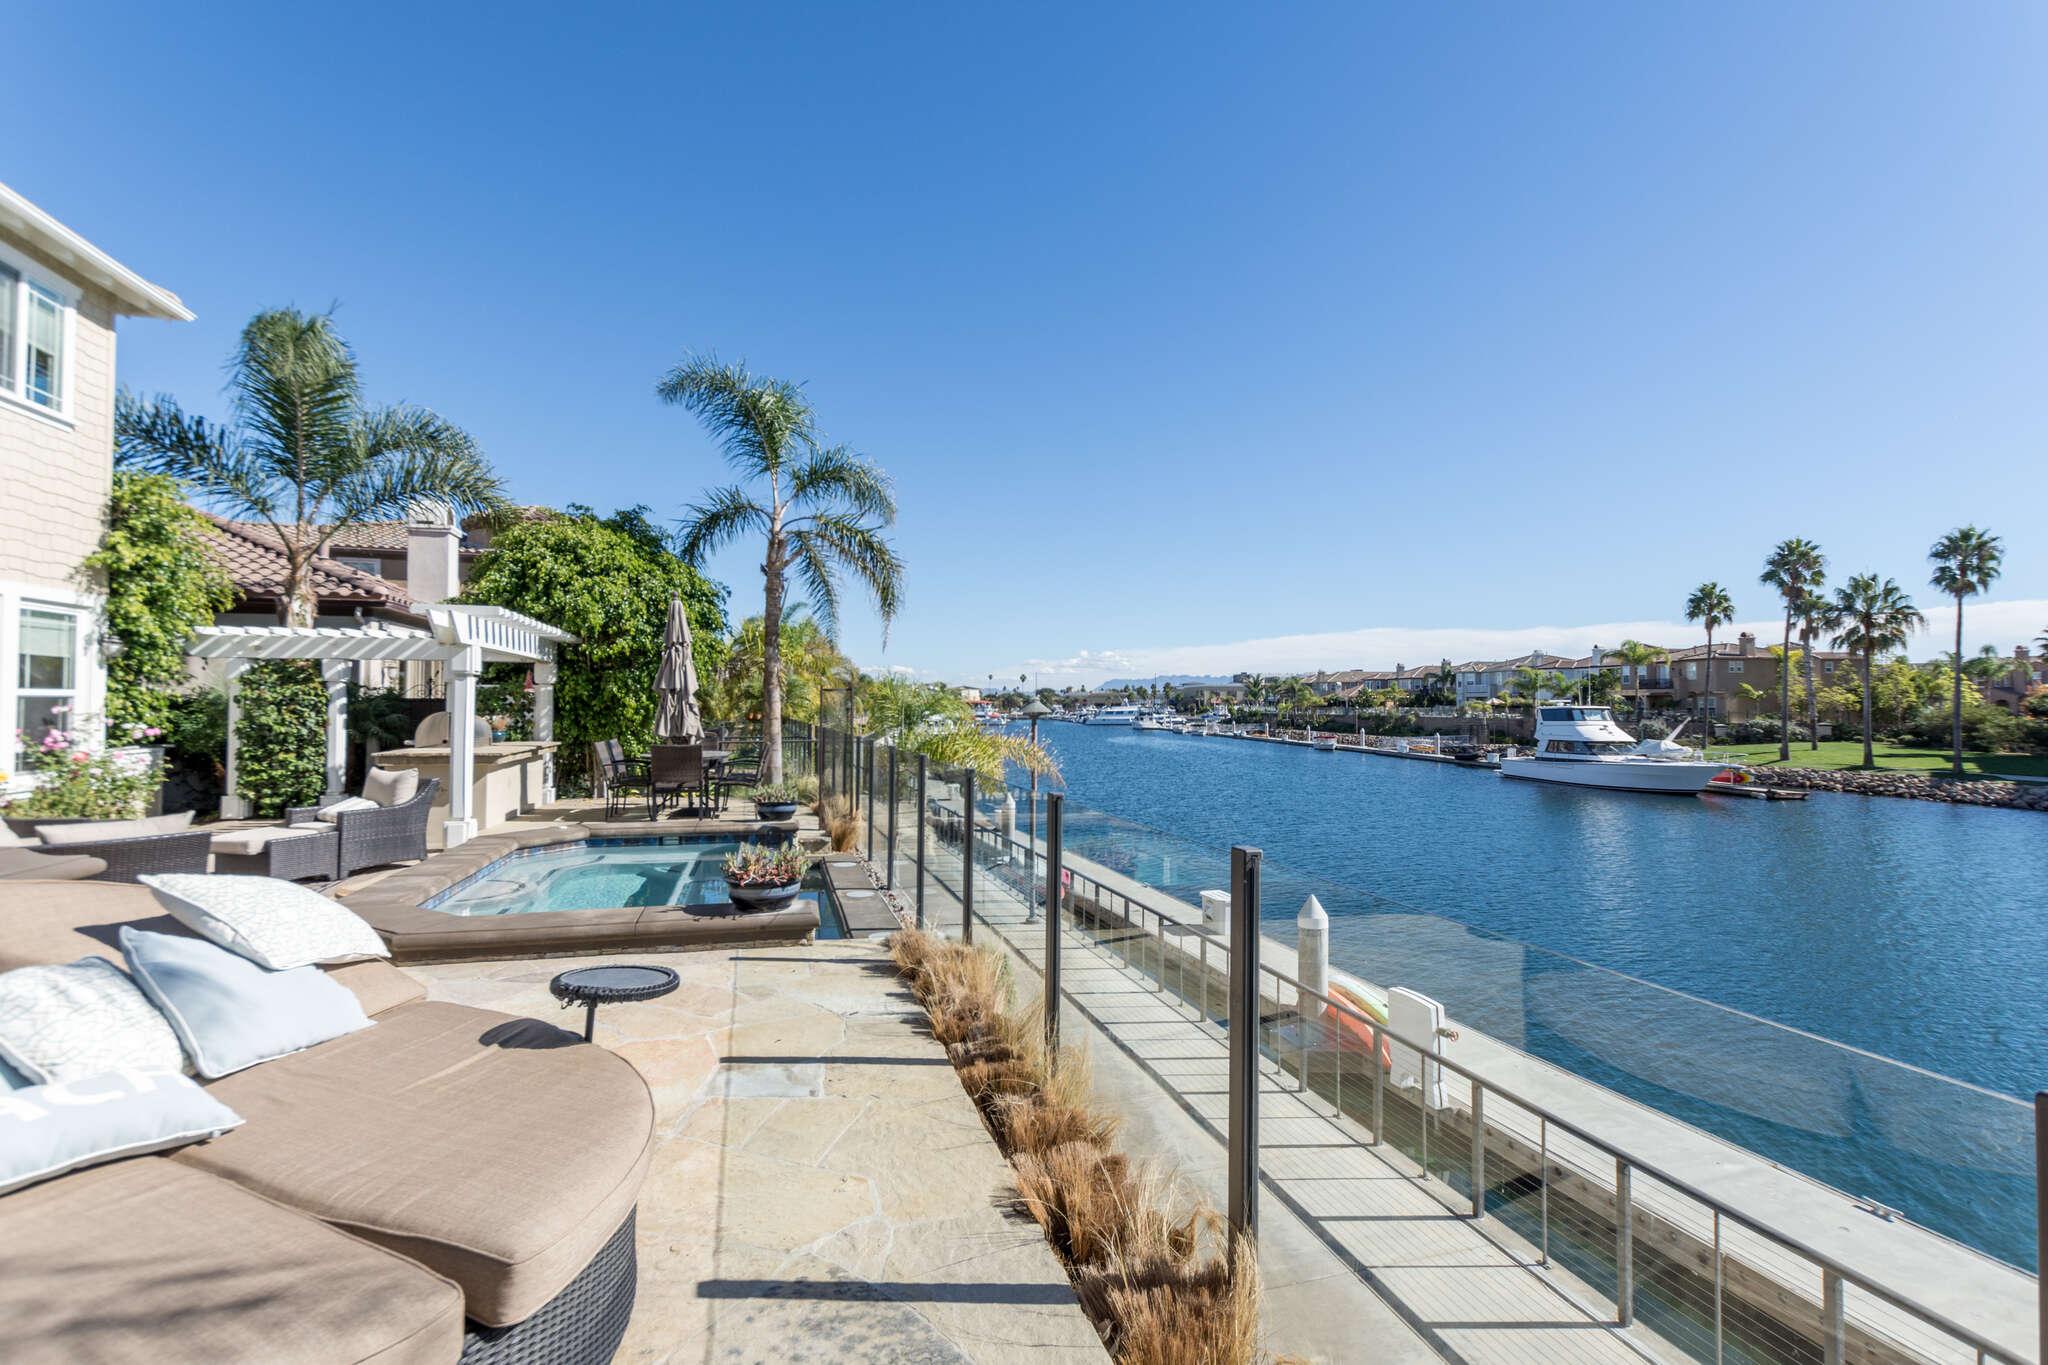 Single Family for Sale at 4134 Caribbean St Oxnard, California 93035 United States